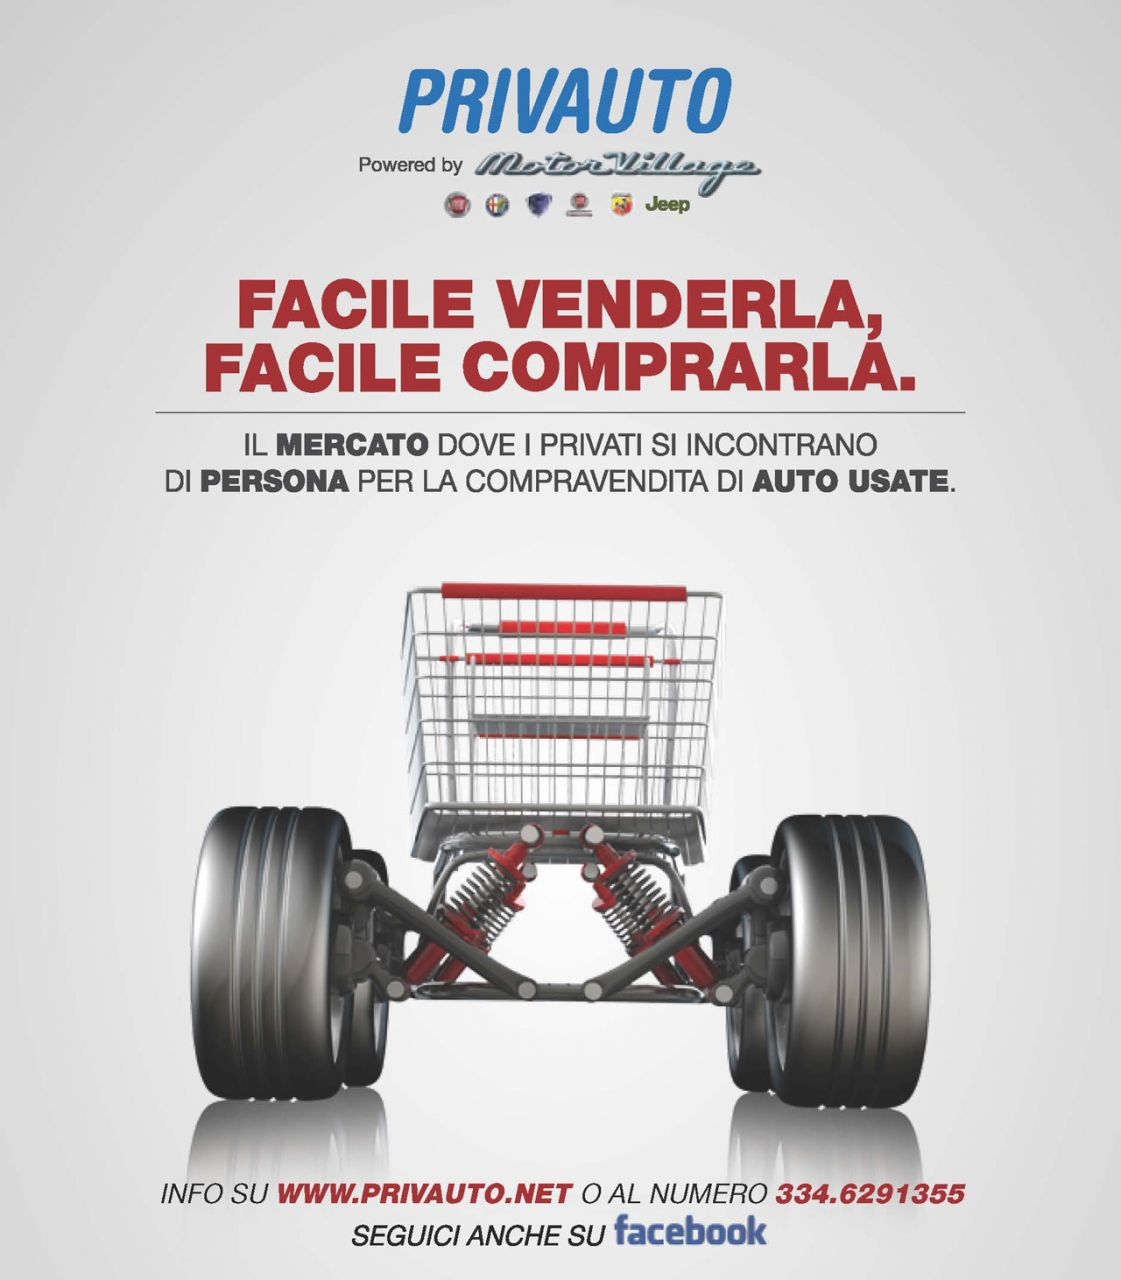 Motor Village Italia presenta 'Privauto'